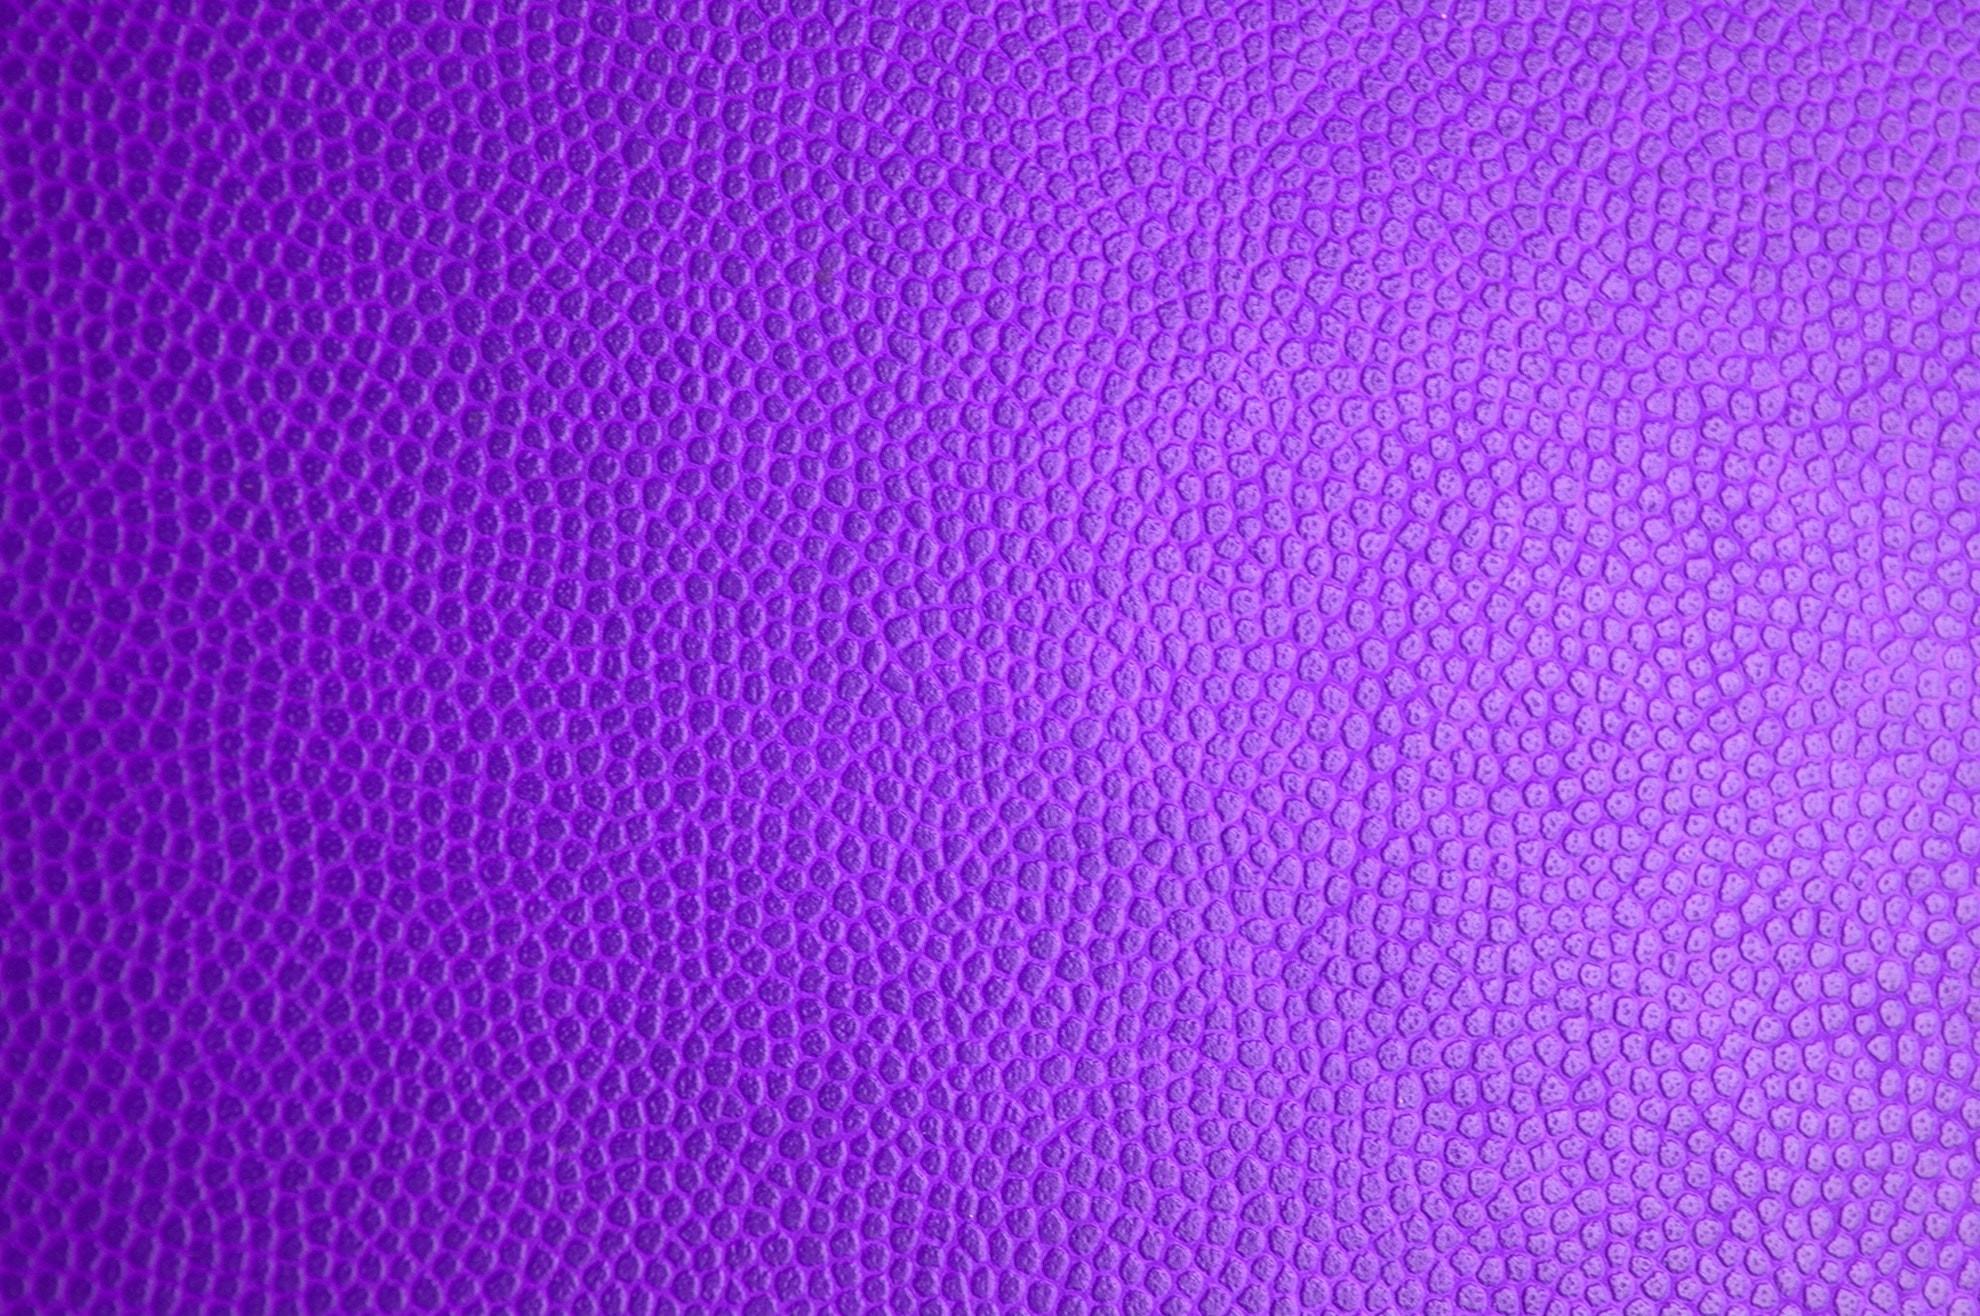 1920x1080 purple design widescreen wallpaper wide wallpapers net x